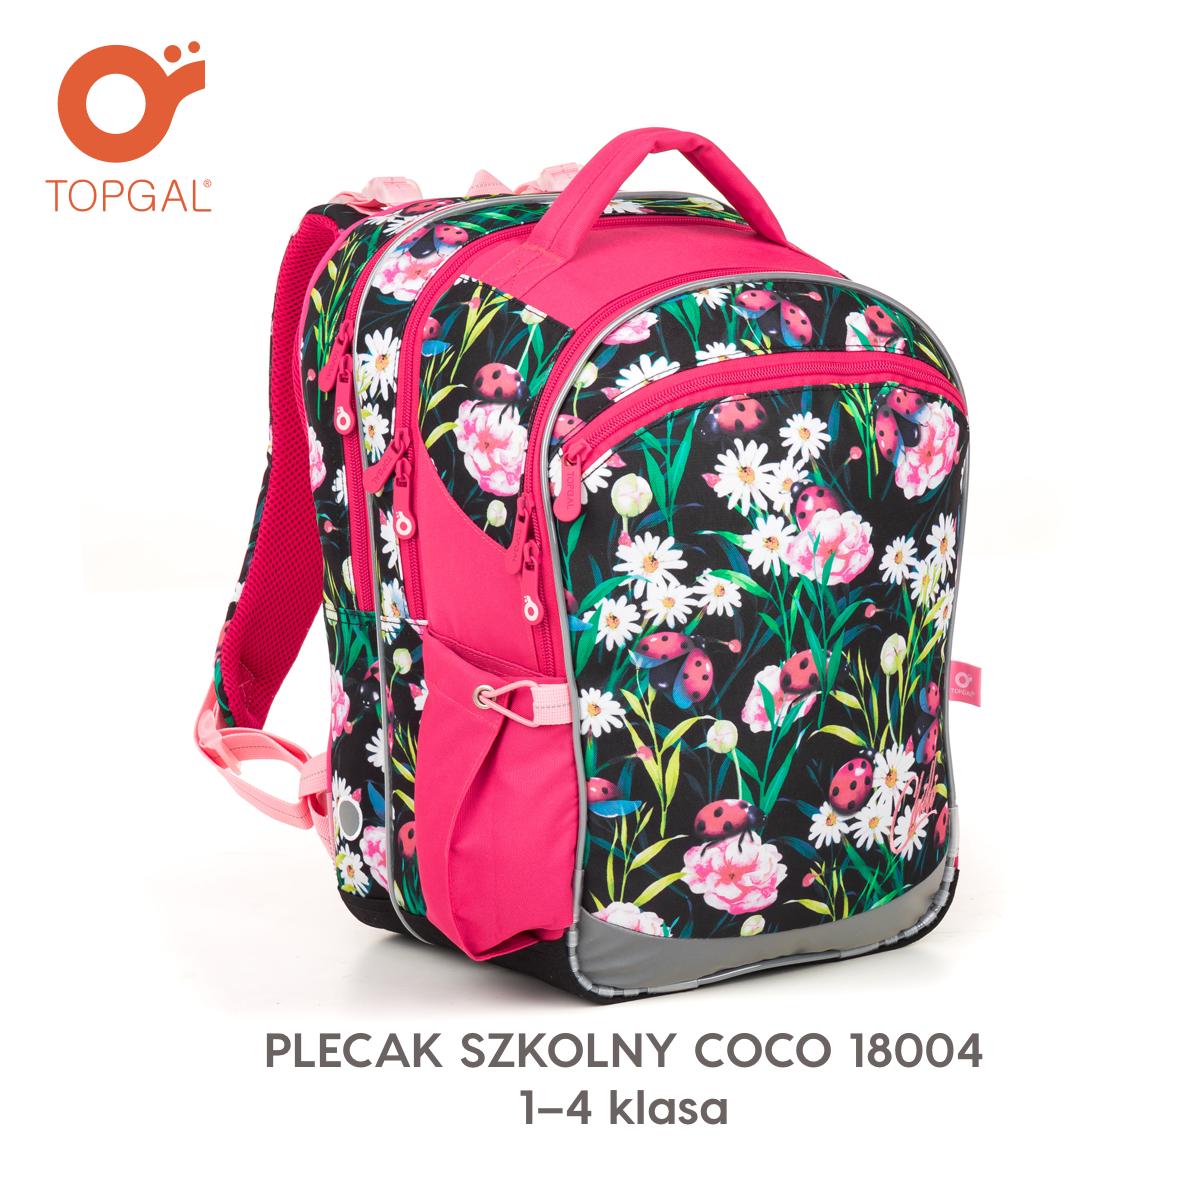 Plecak Szkolny Coco 18004 Bags Llbean Backpack Vera Bradley Backpack